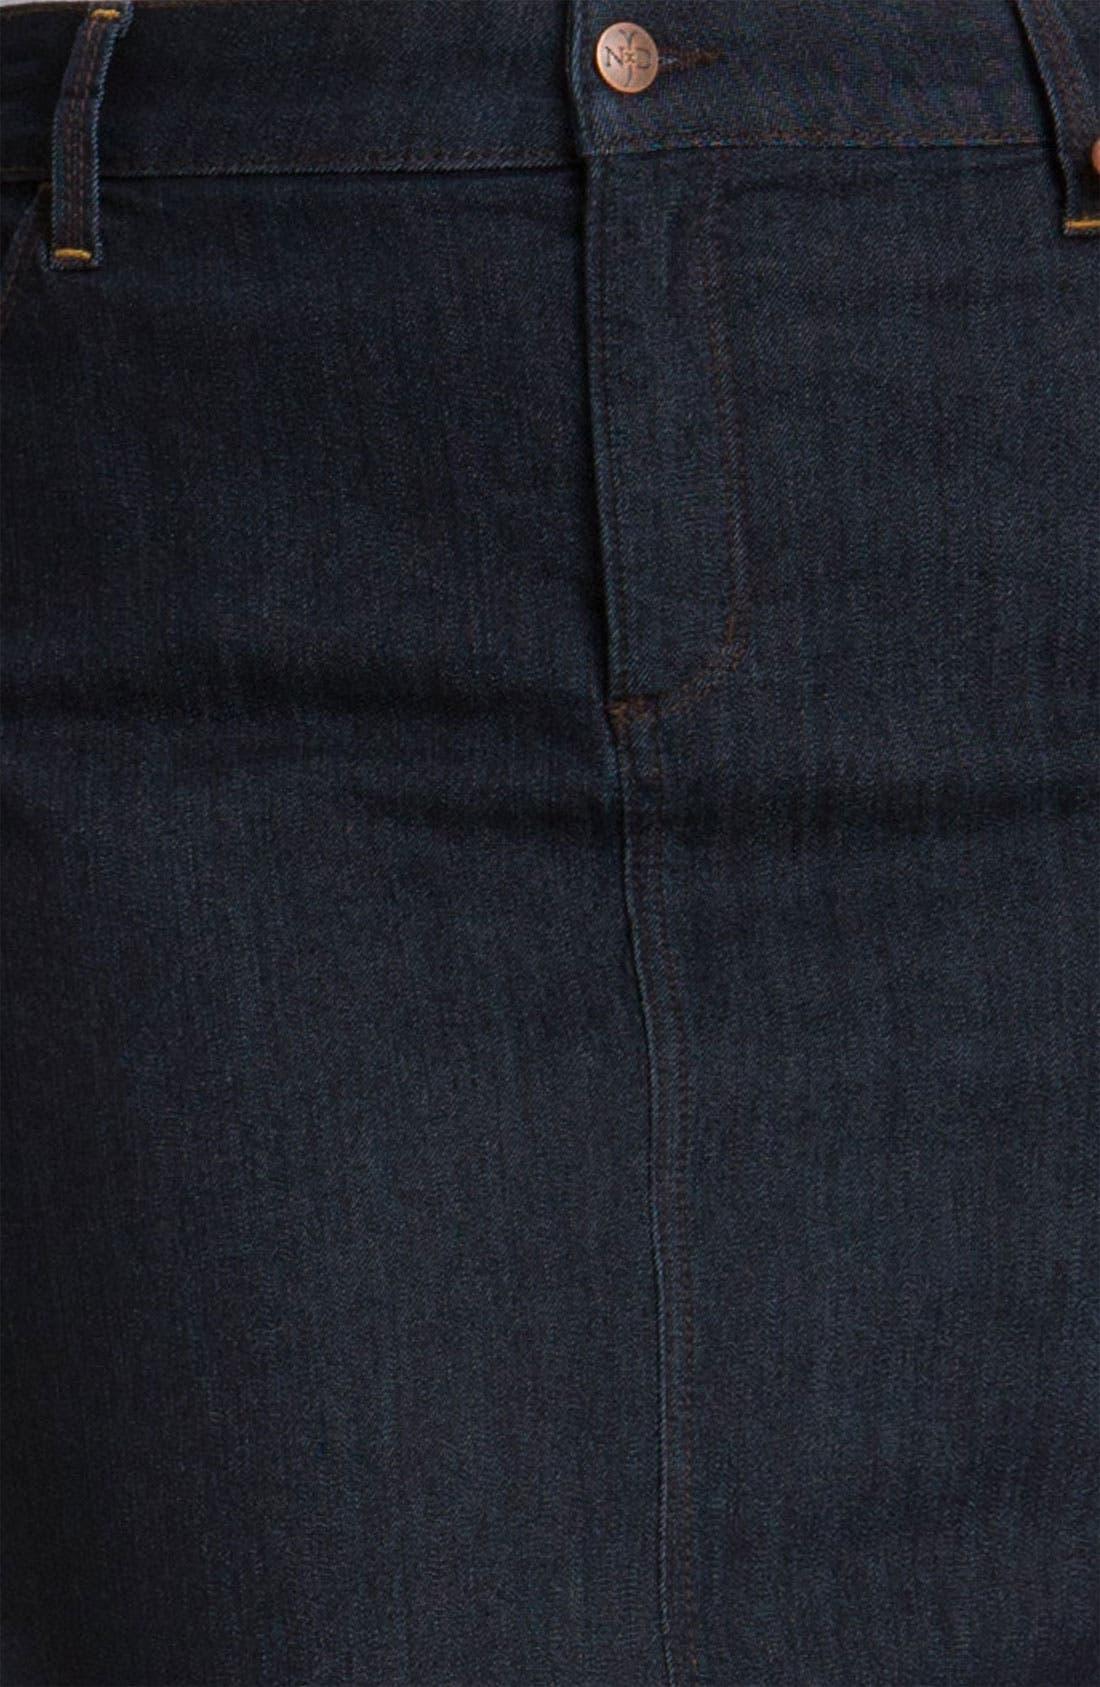 Alternate Image 3  - NYDJ 'Emma' Stretch Twill Skirt (Plus Size)